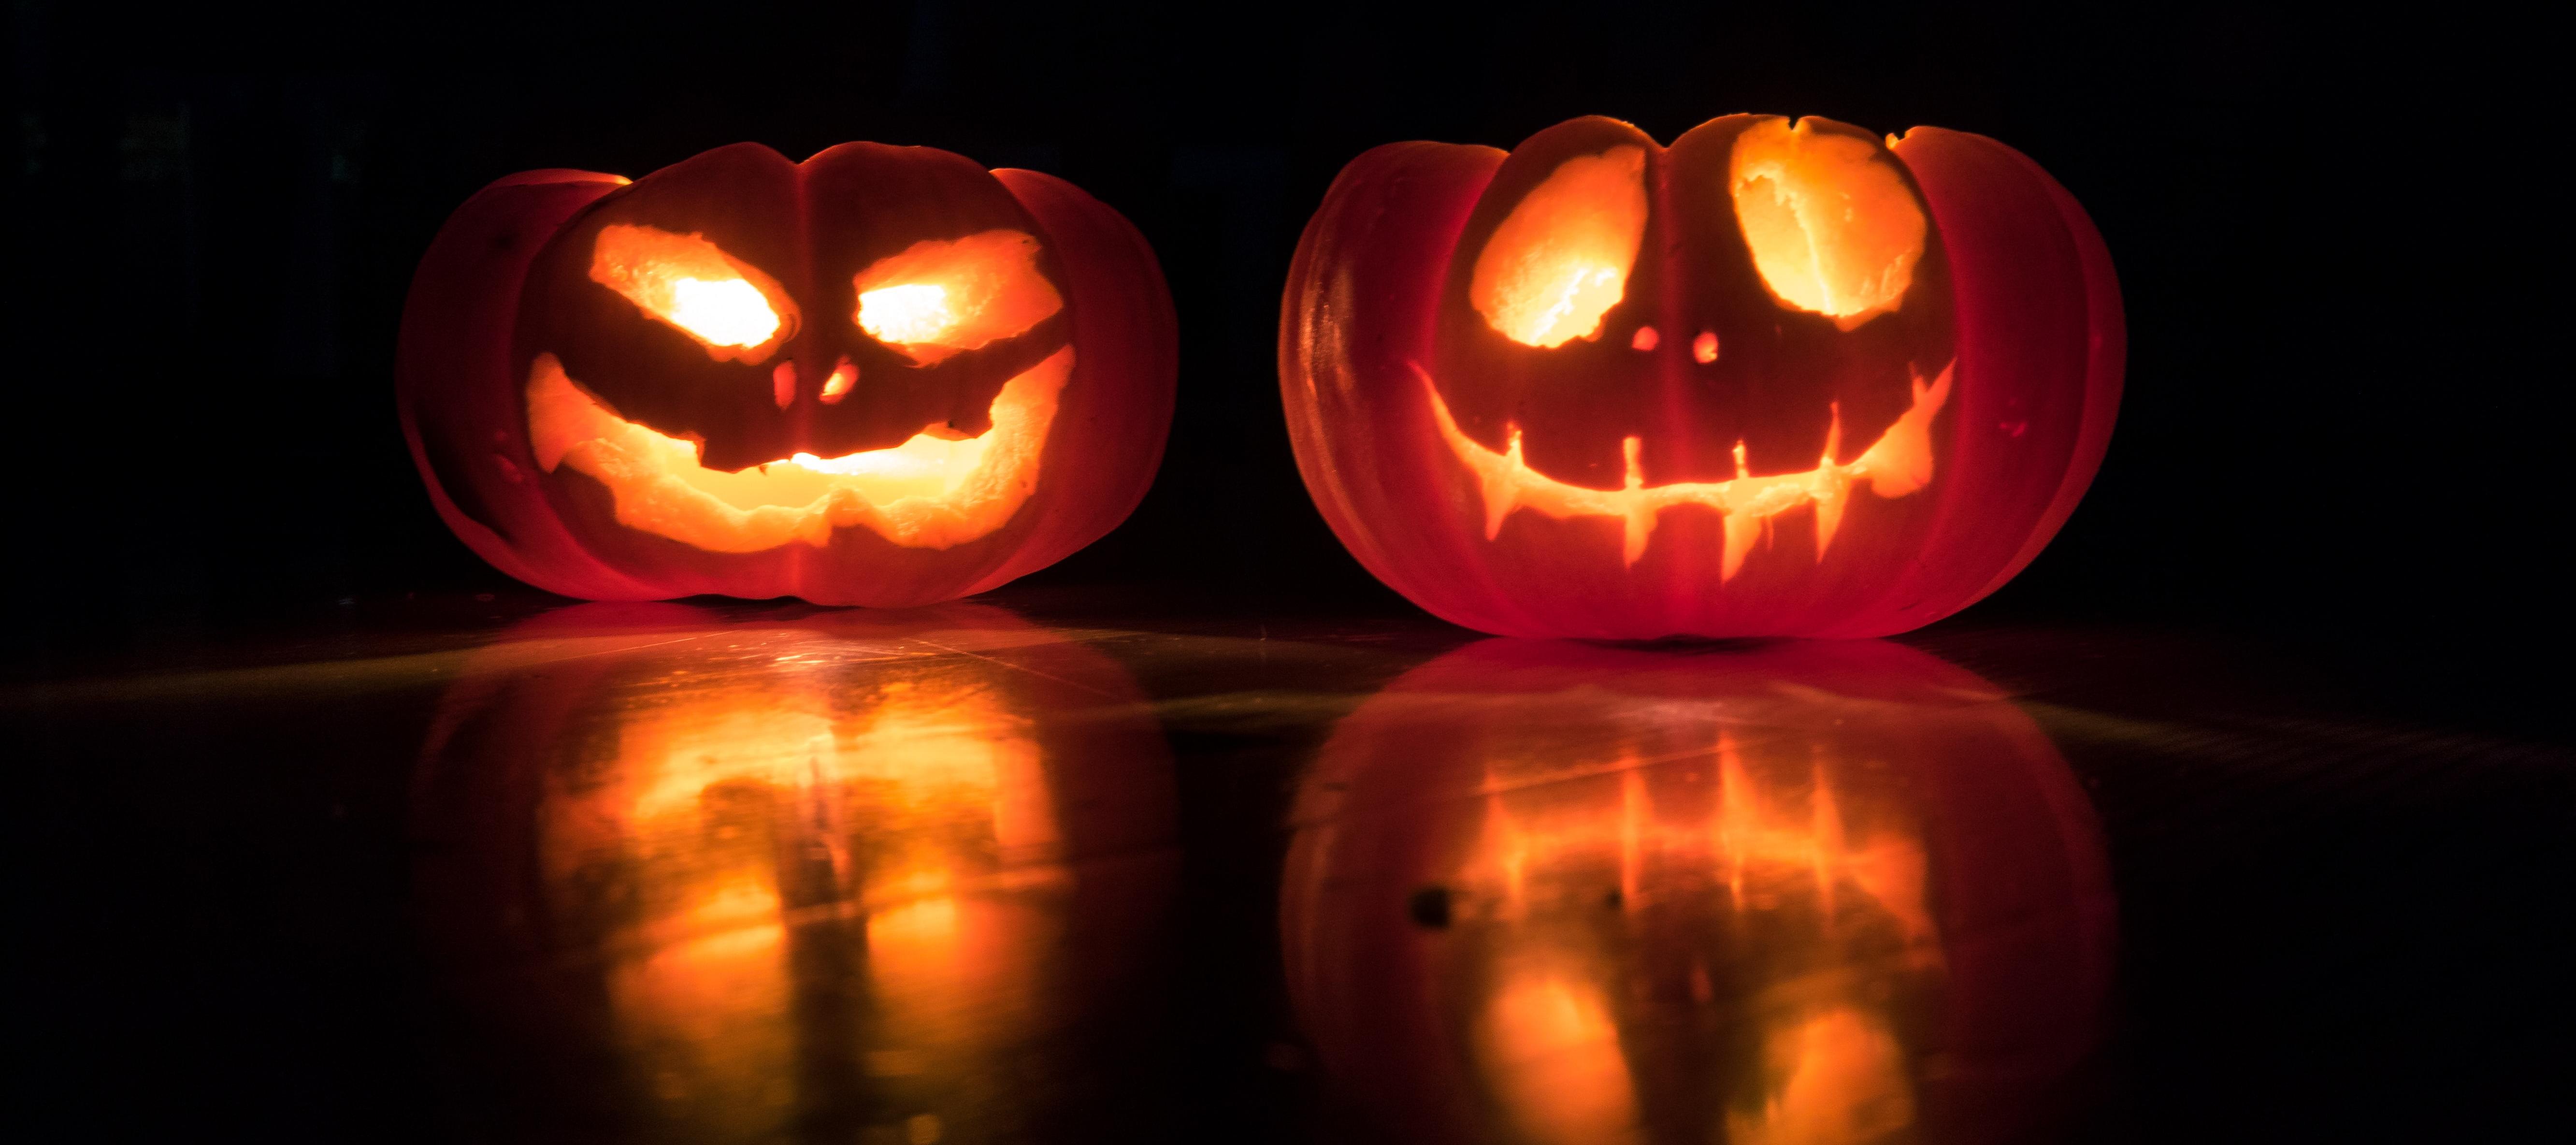 heroic fundraising blog image trick or treat halloween pumpkins